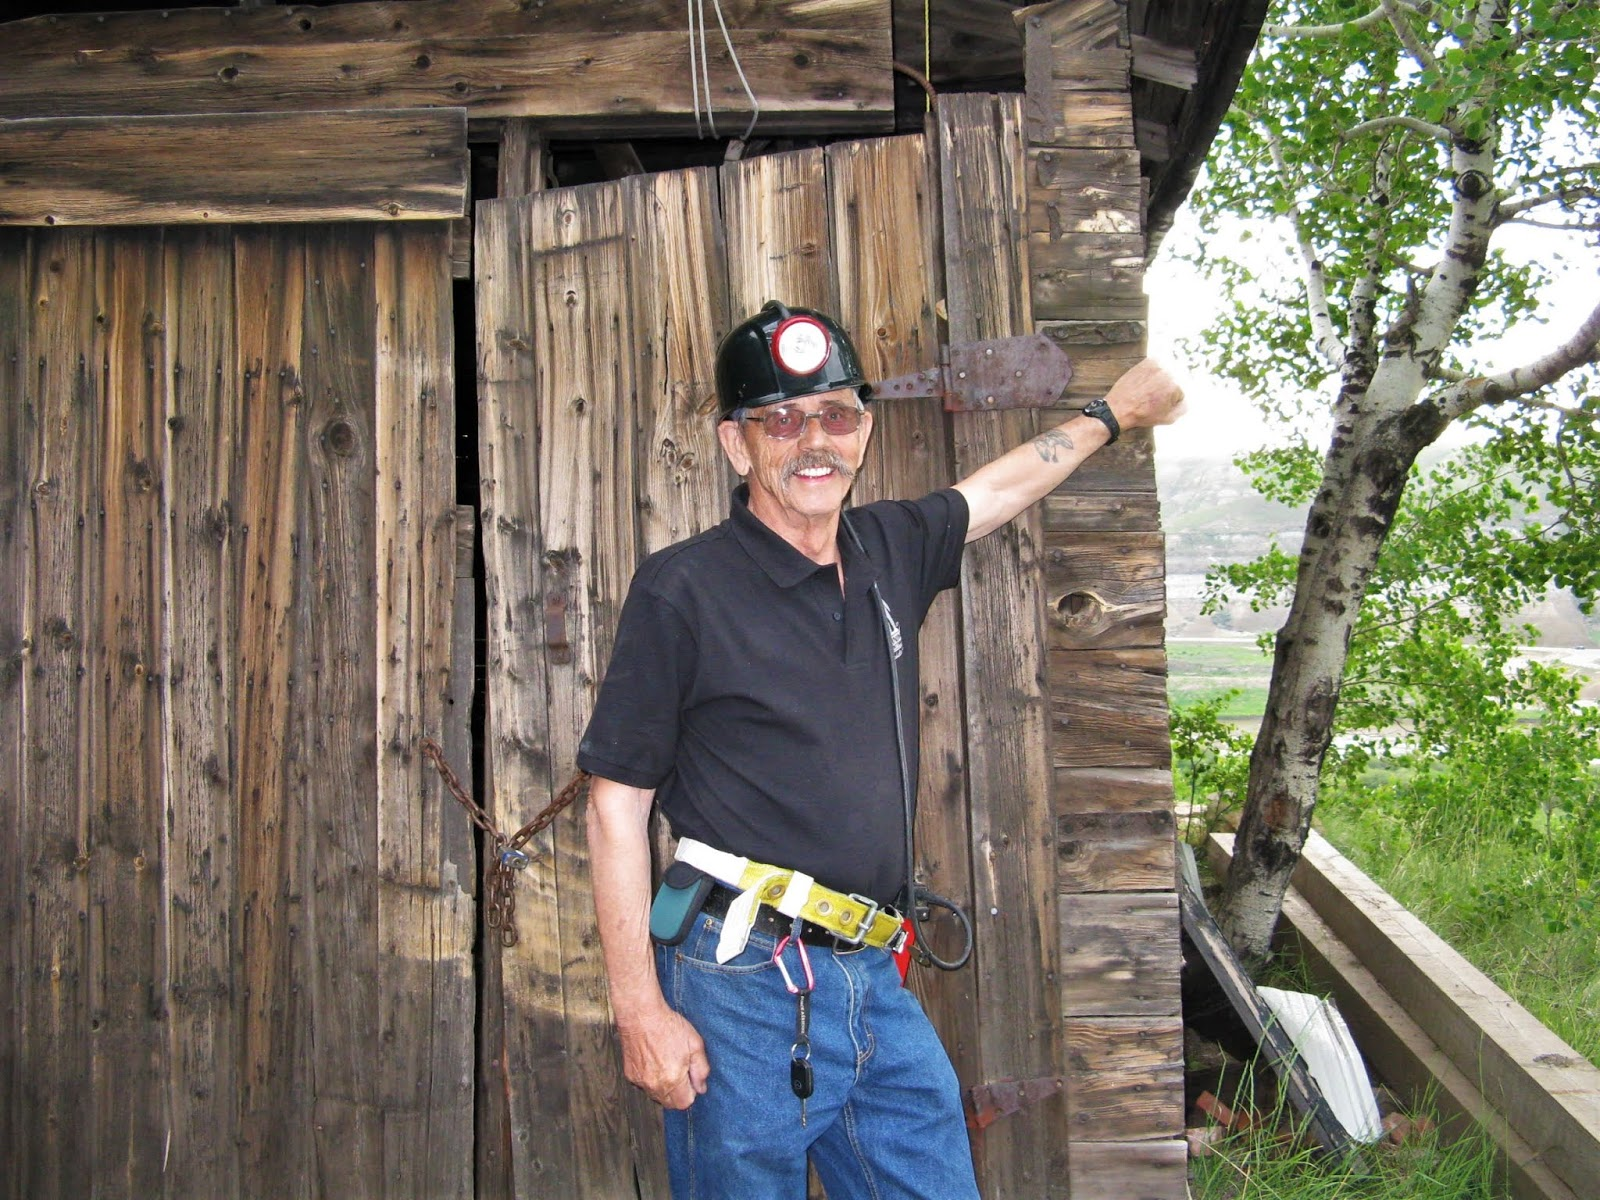 Bob Moffatt, fifth generation coal miner